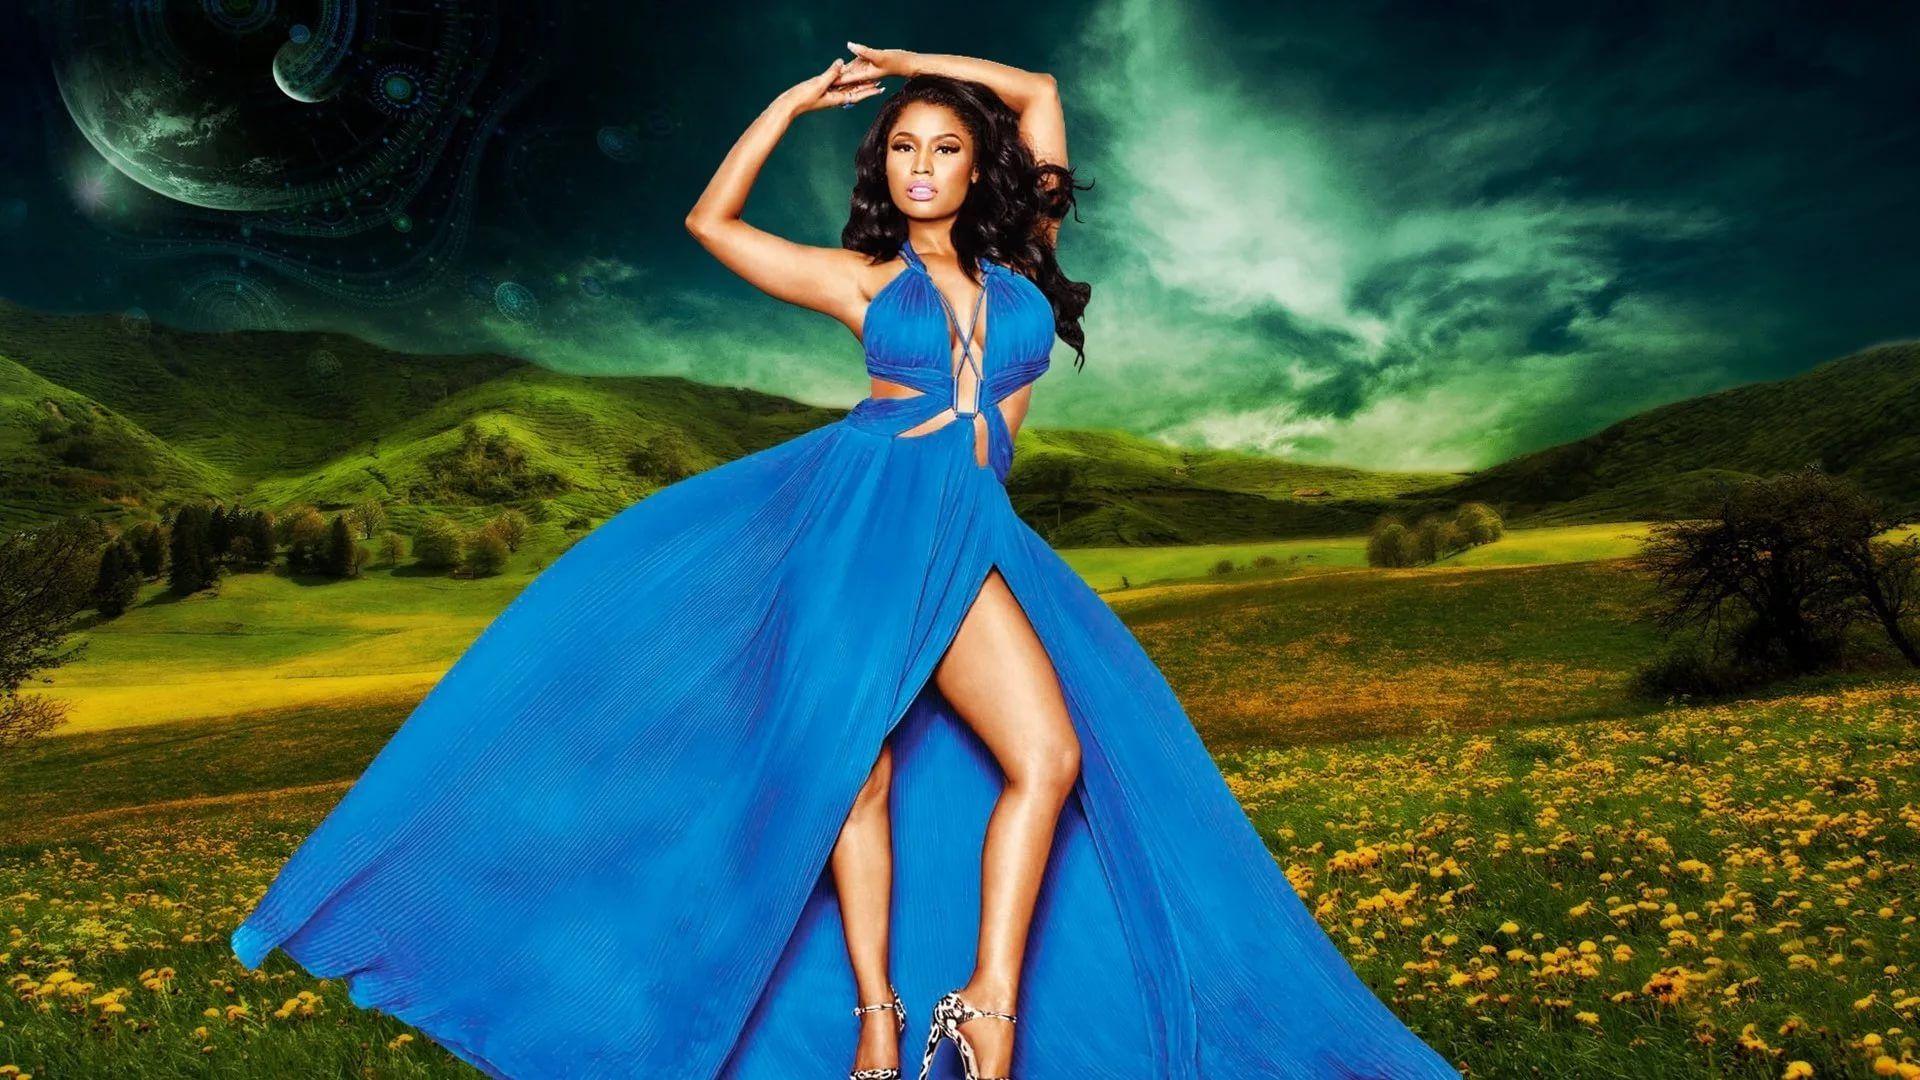 Nicki Minaj Image